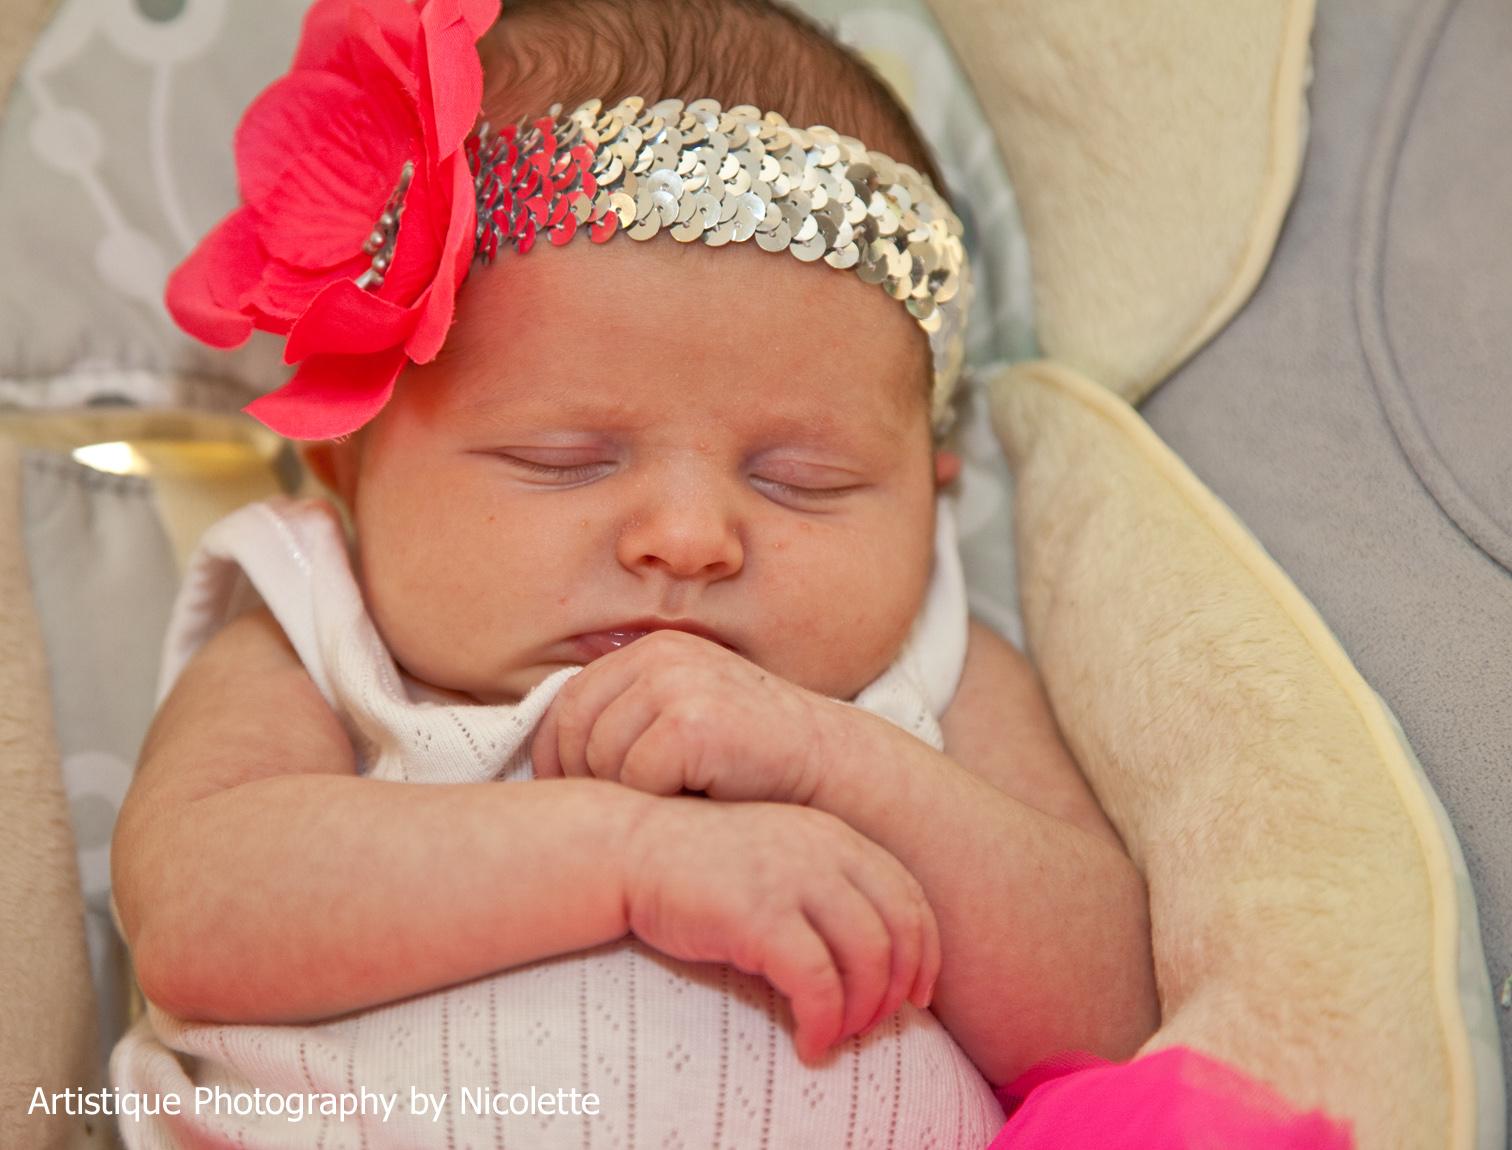 Wedding Photography: Baby Ella's Photo Shoot - Artistique ...